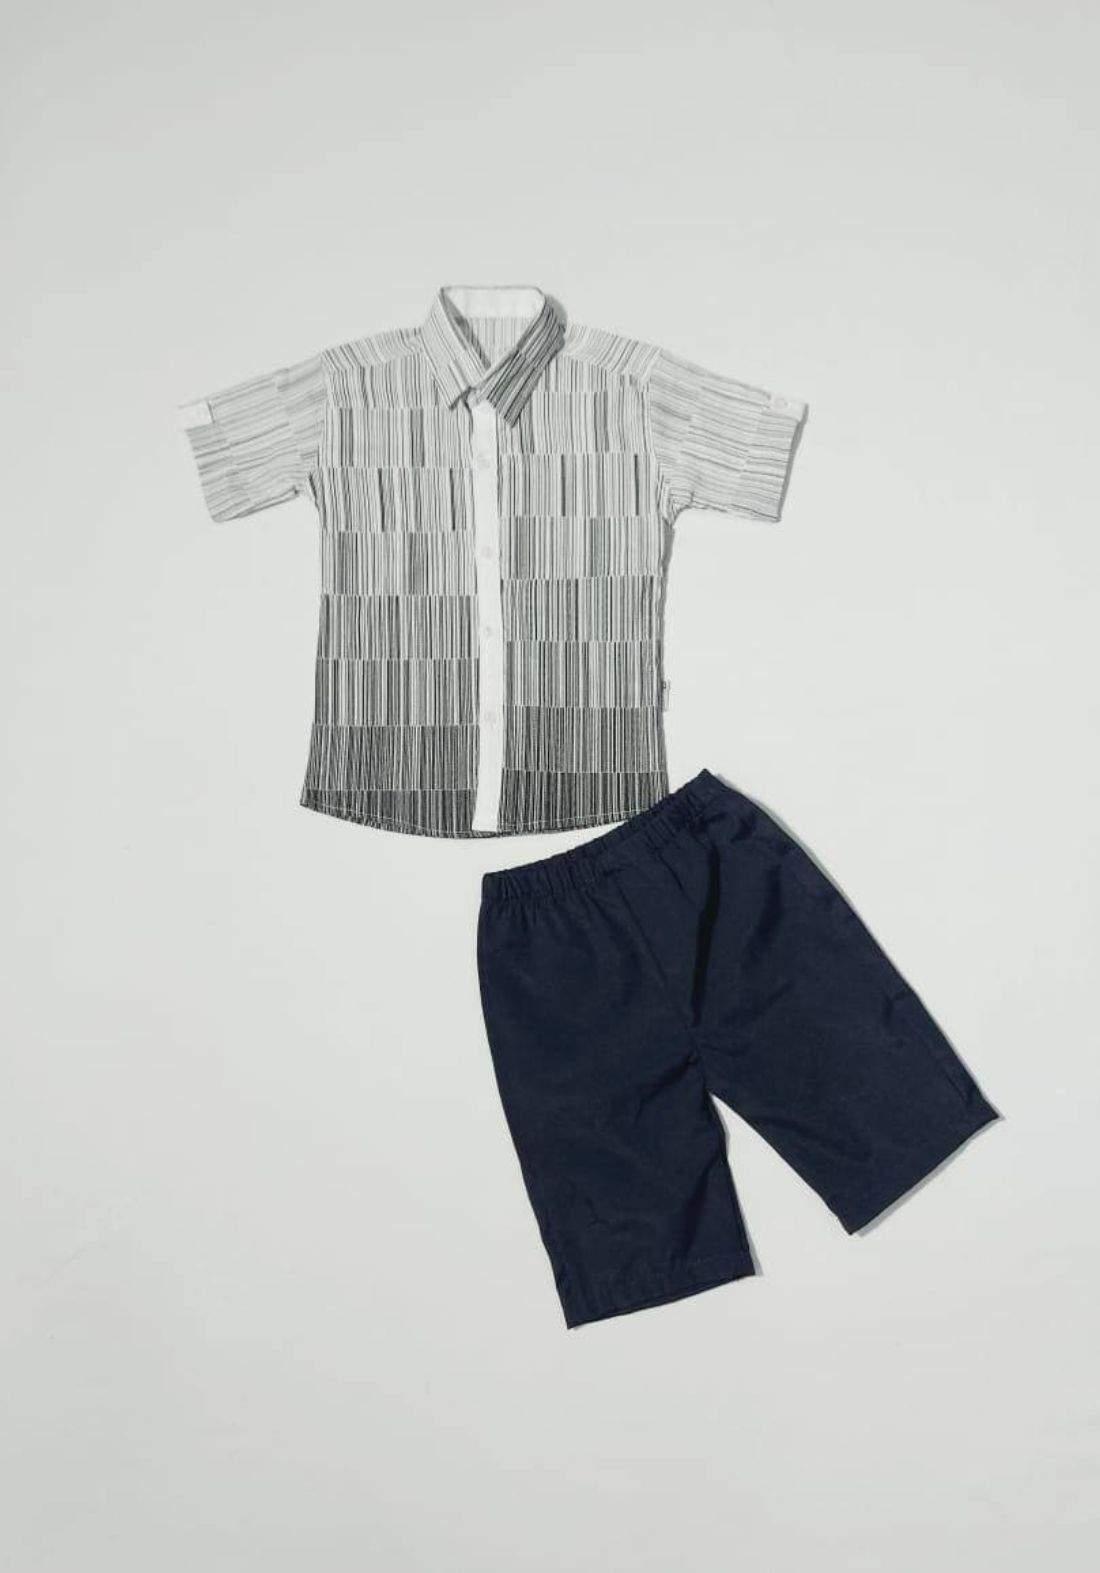 Boys' outfit (shirt and short )(طقم ولادي (قميص وشورت